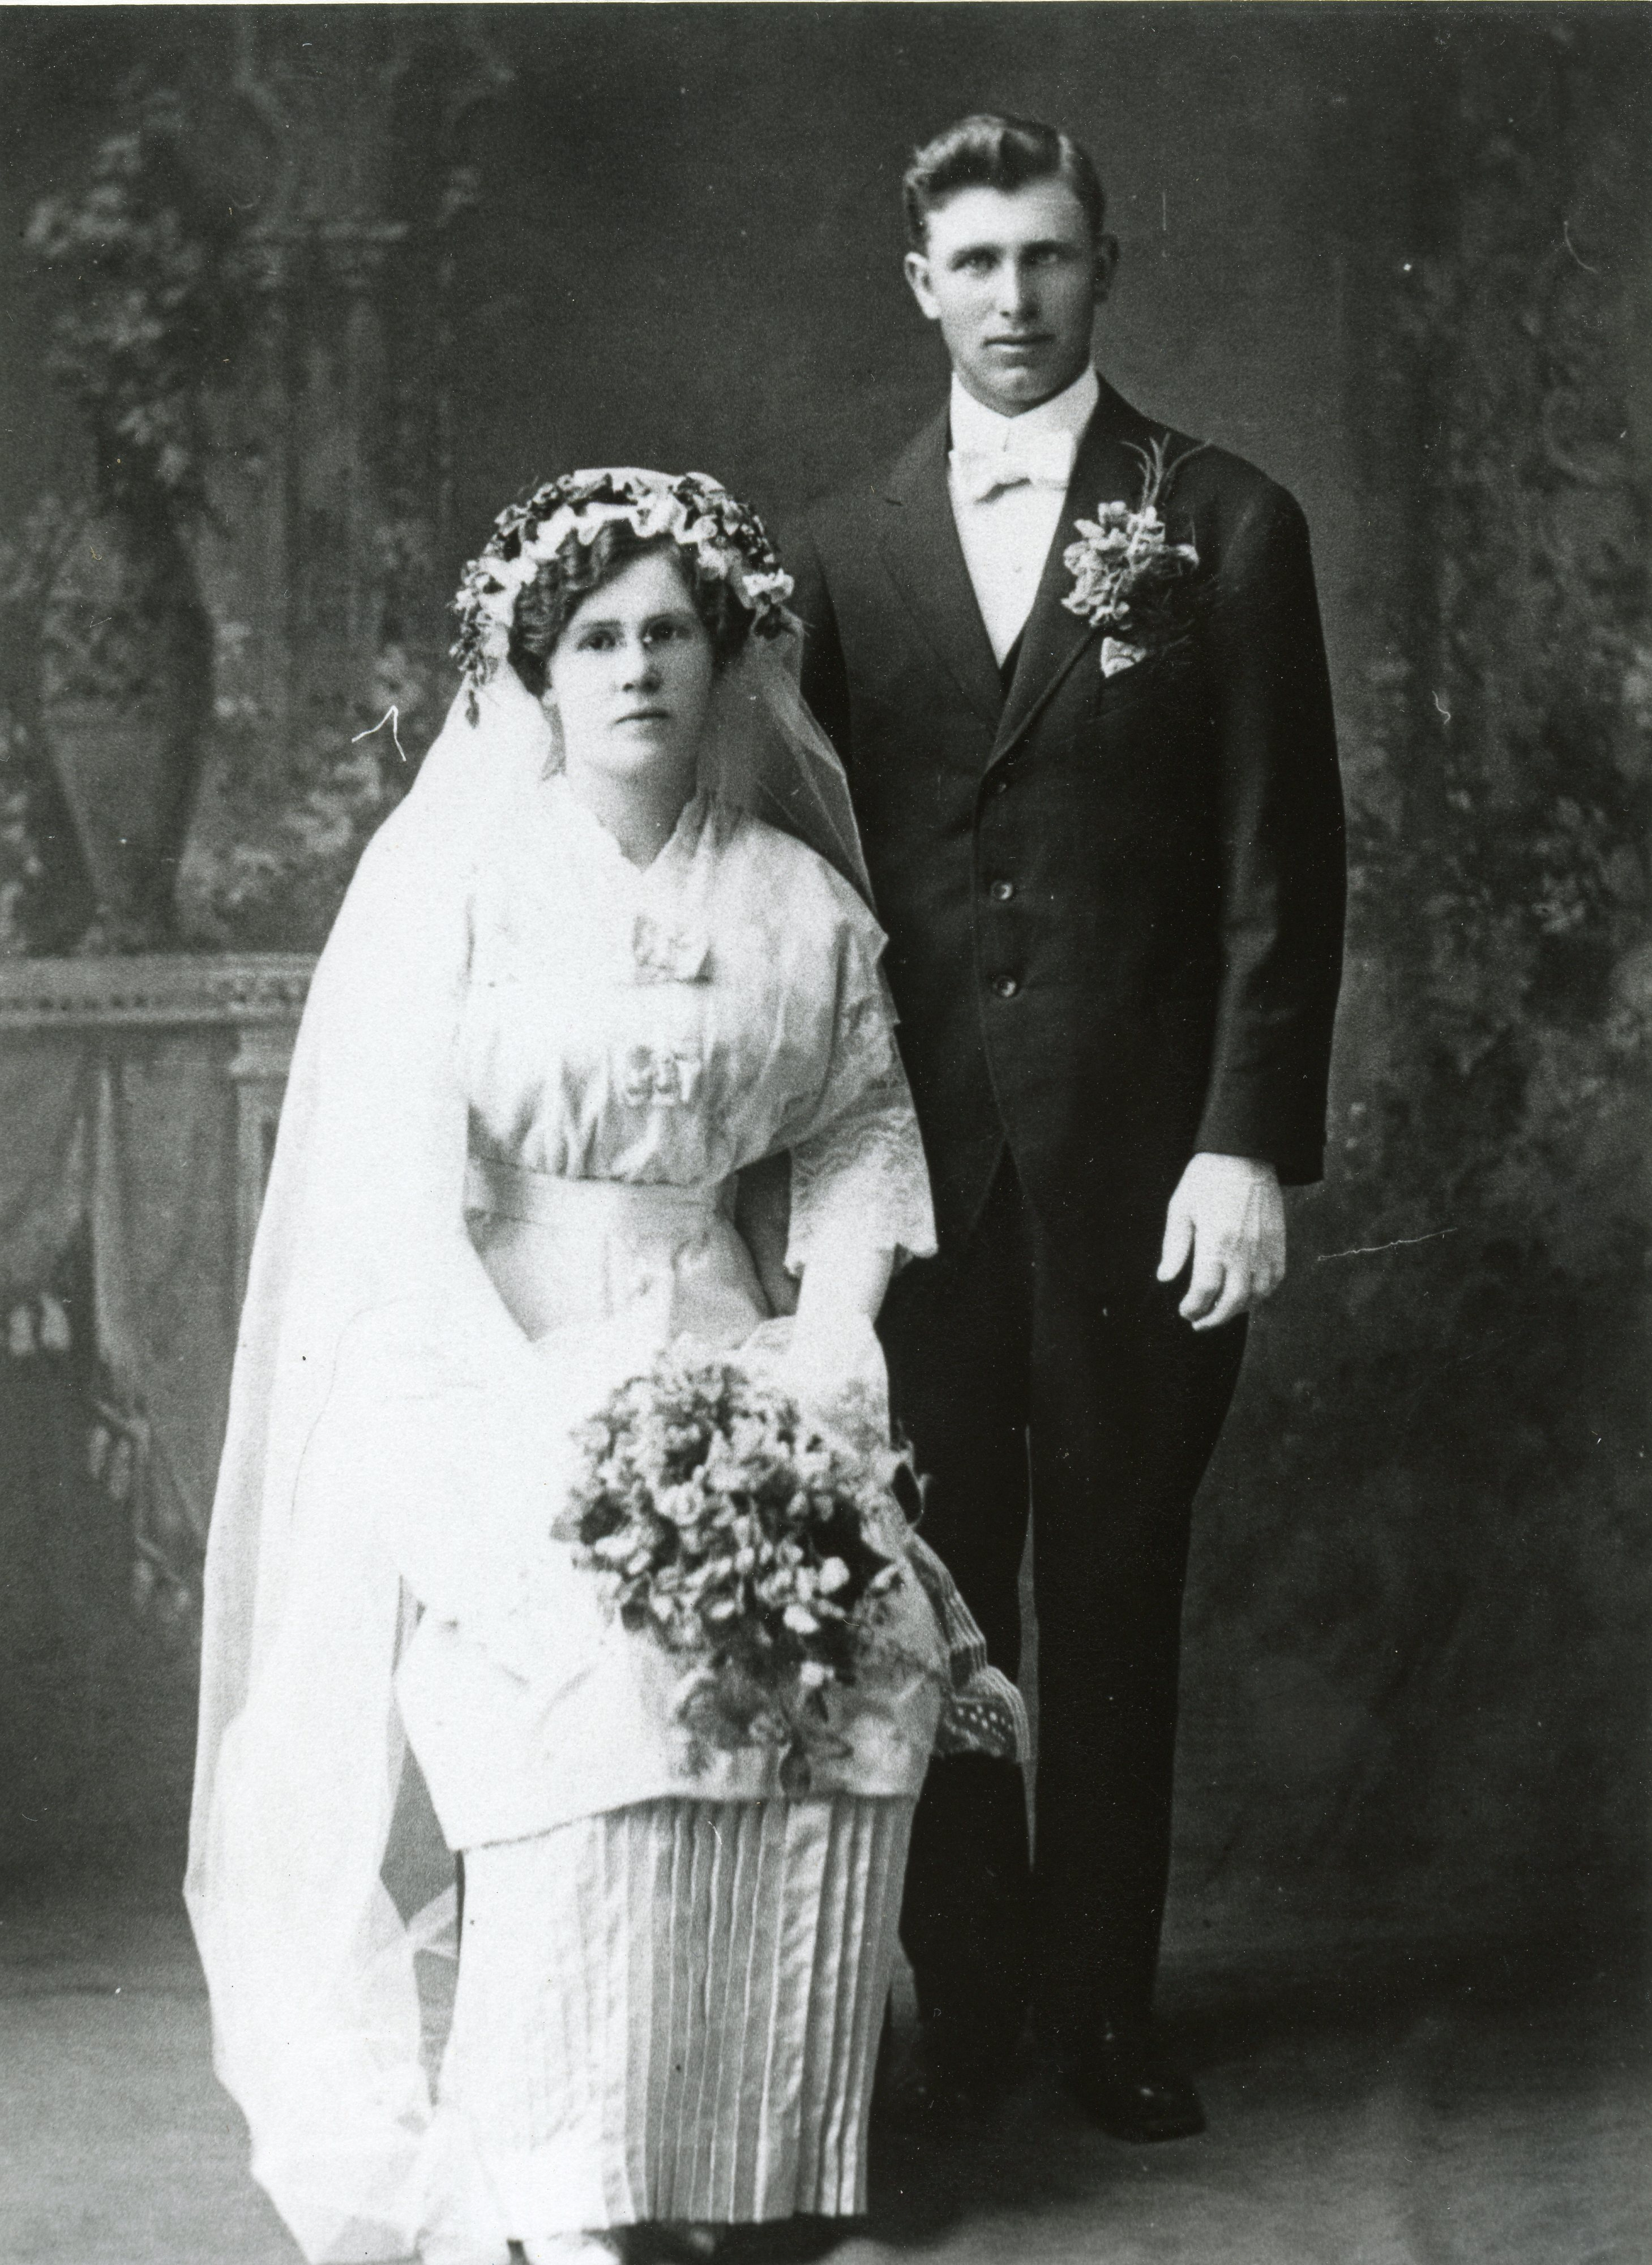 Olena Josephine Aspelund